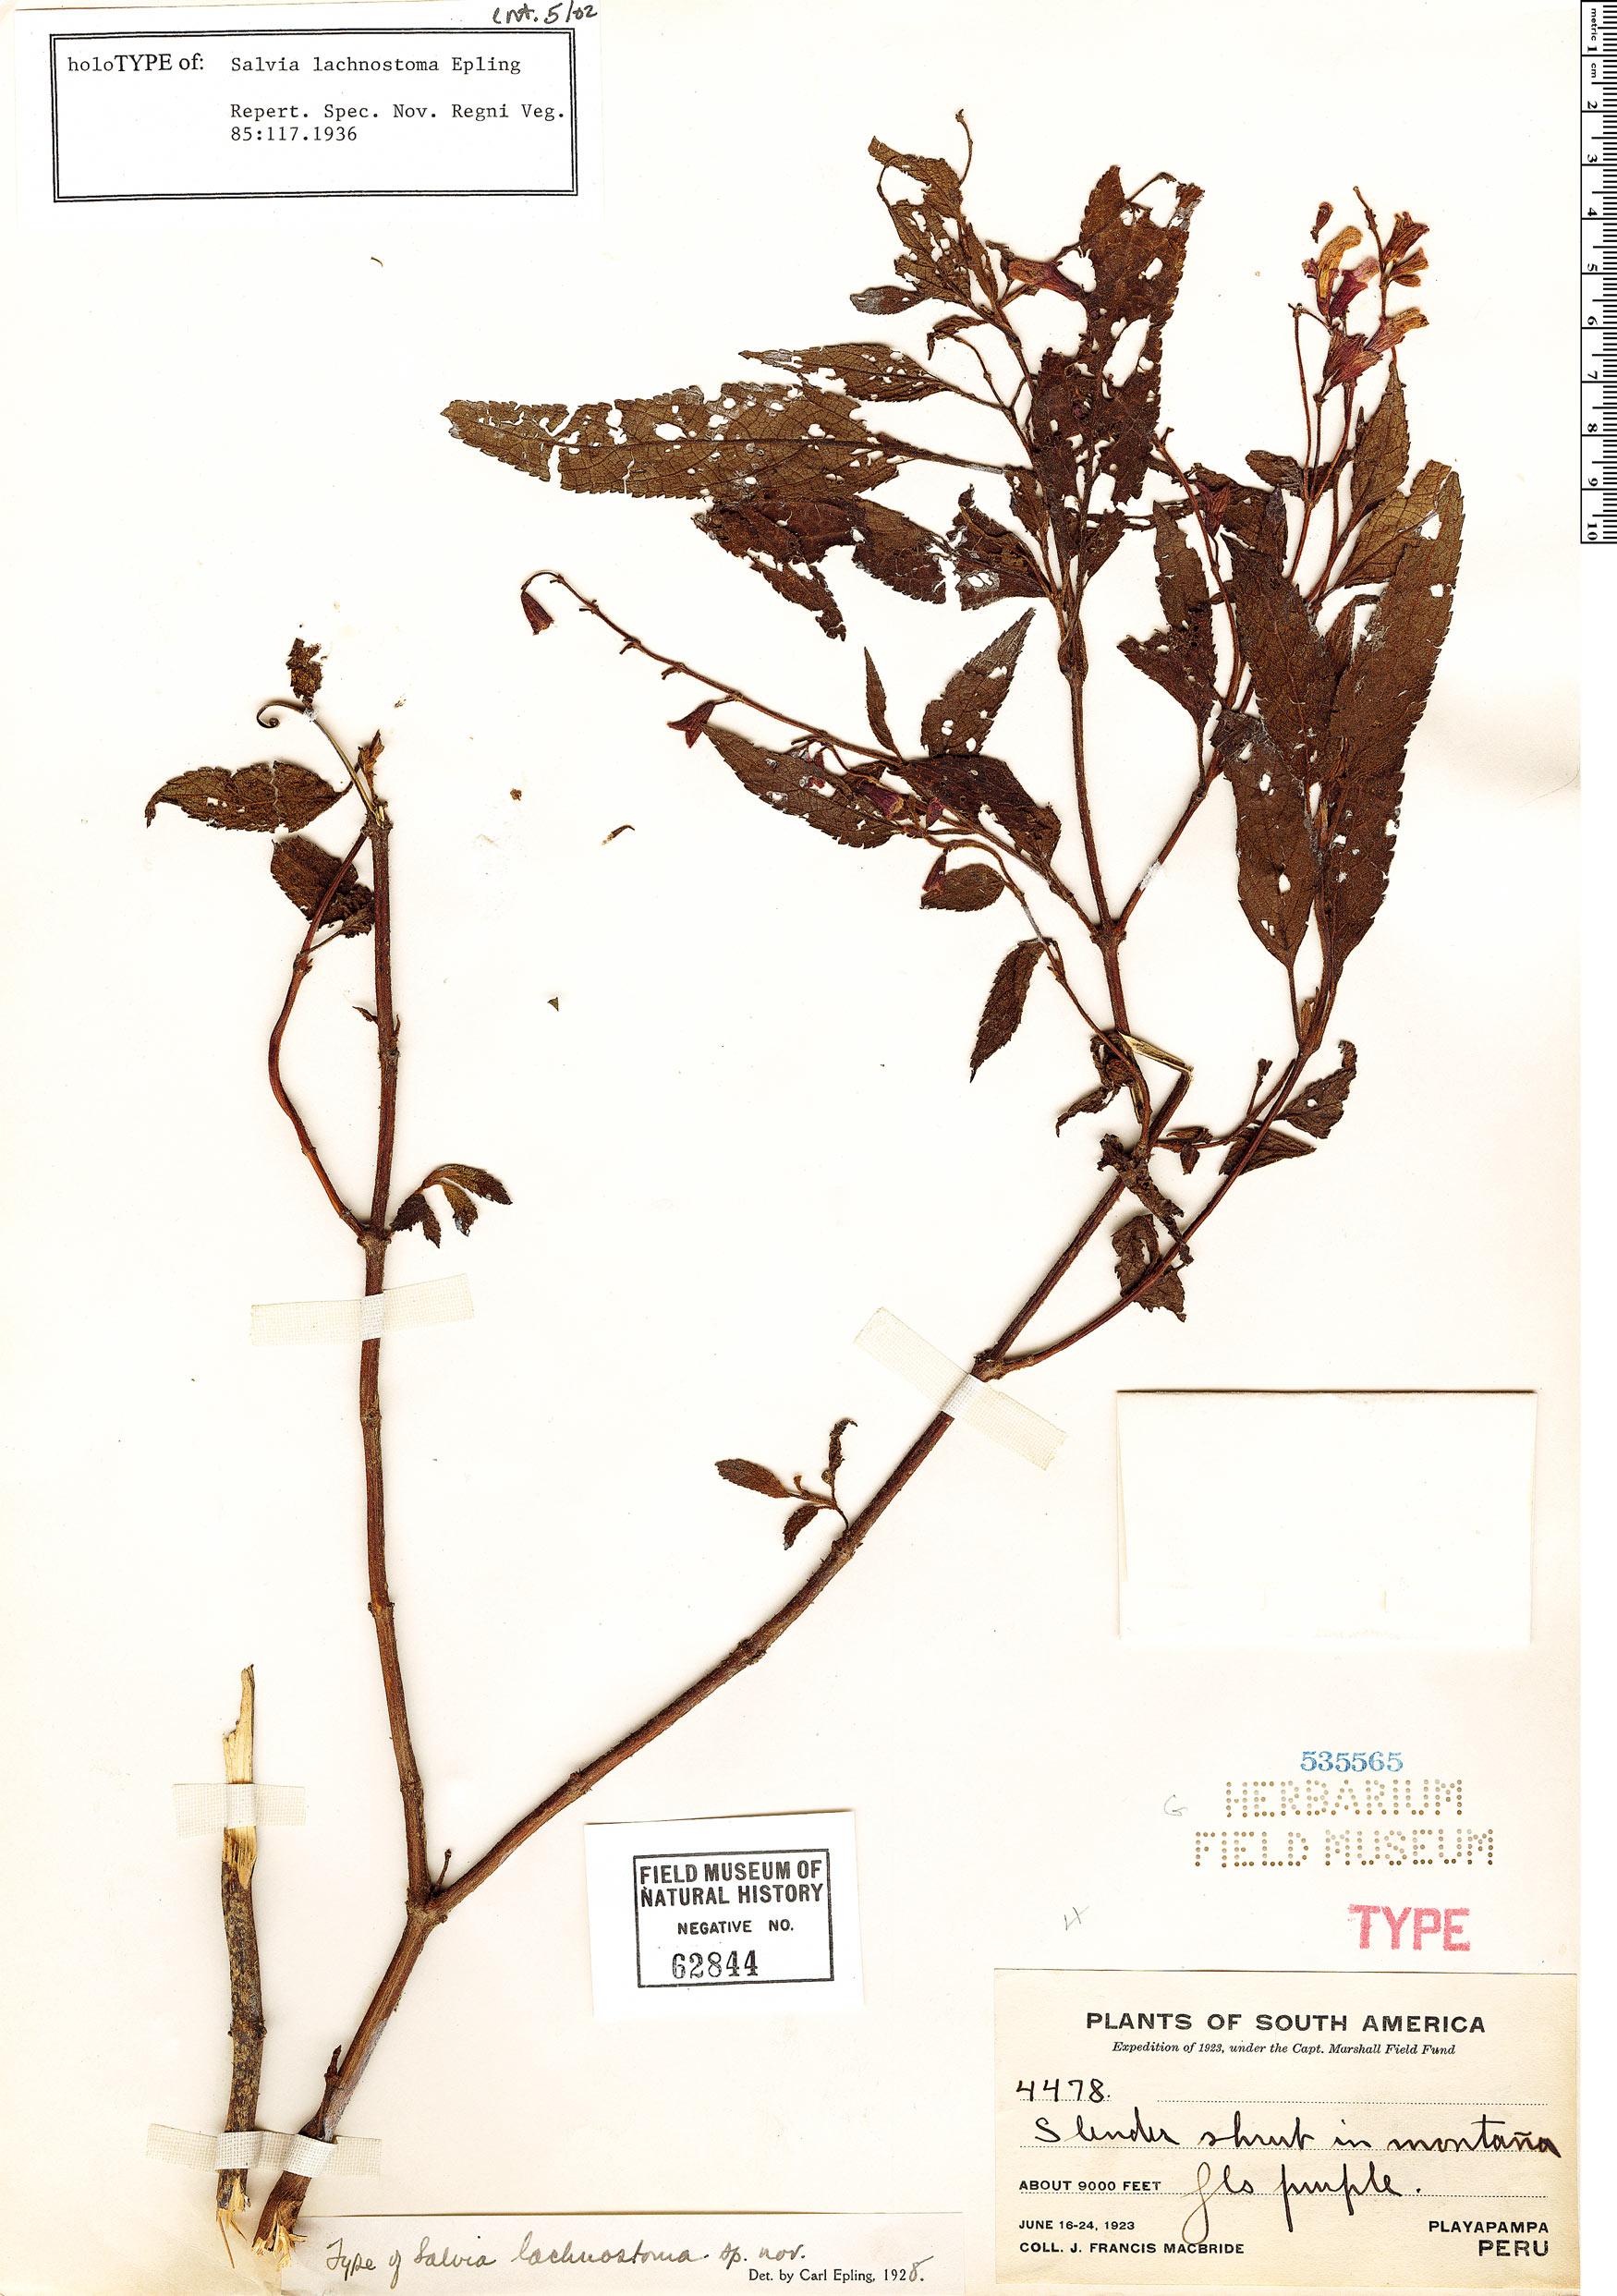 Specimen: Salvia lachnostoma